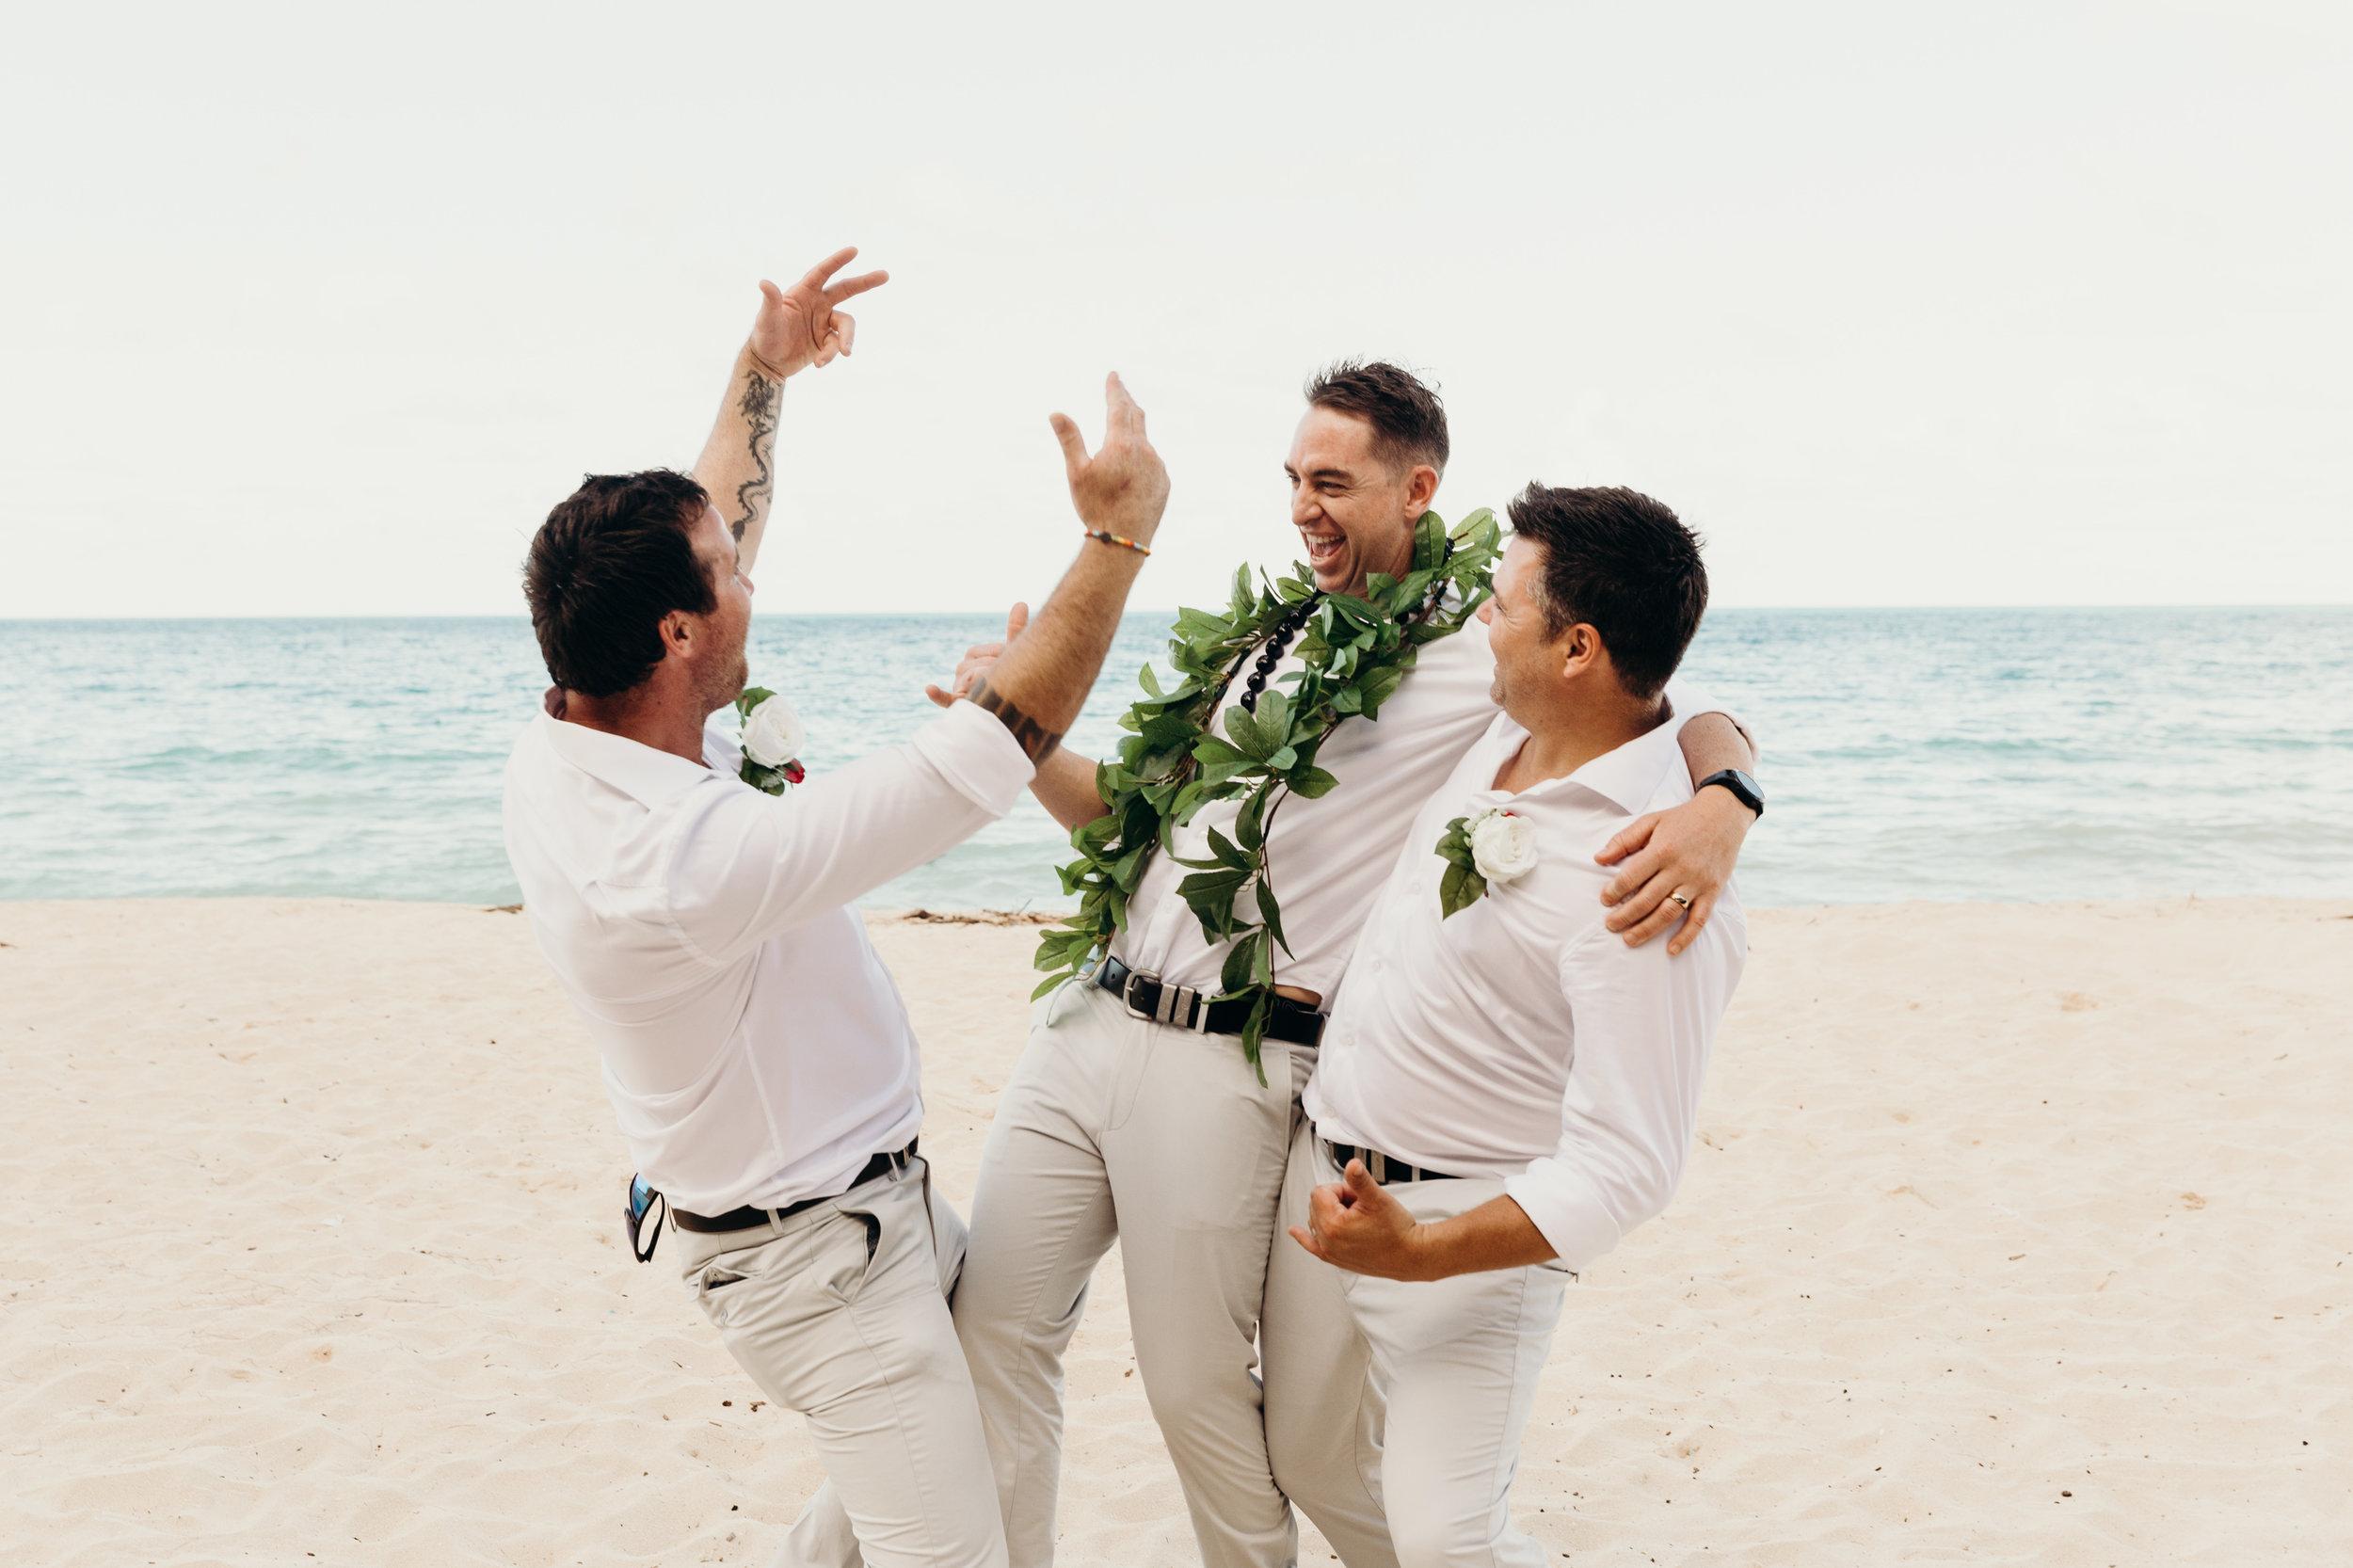 HAWAII-WEDDING-PHOTOGRAPHER-ALOHILANI-RESORT-KEANI-BAKULA-44.jpg